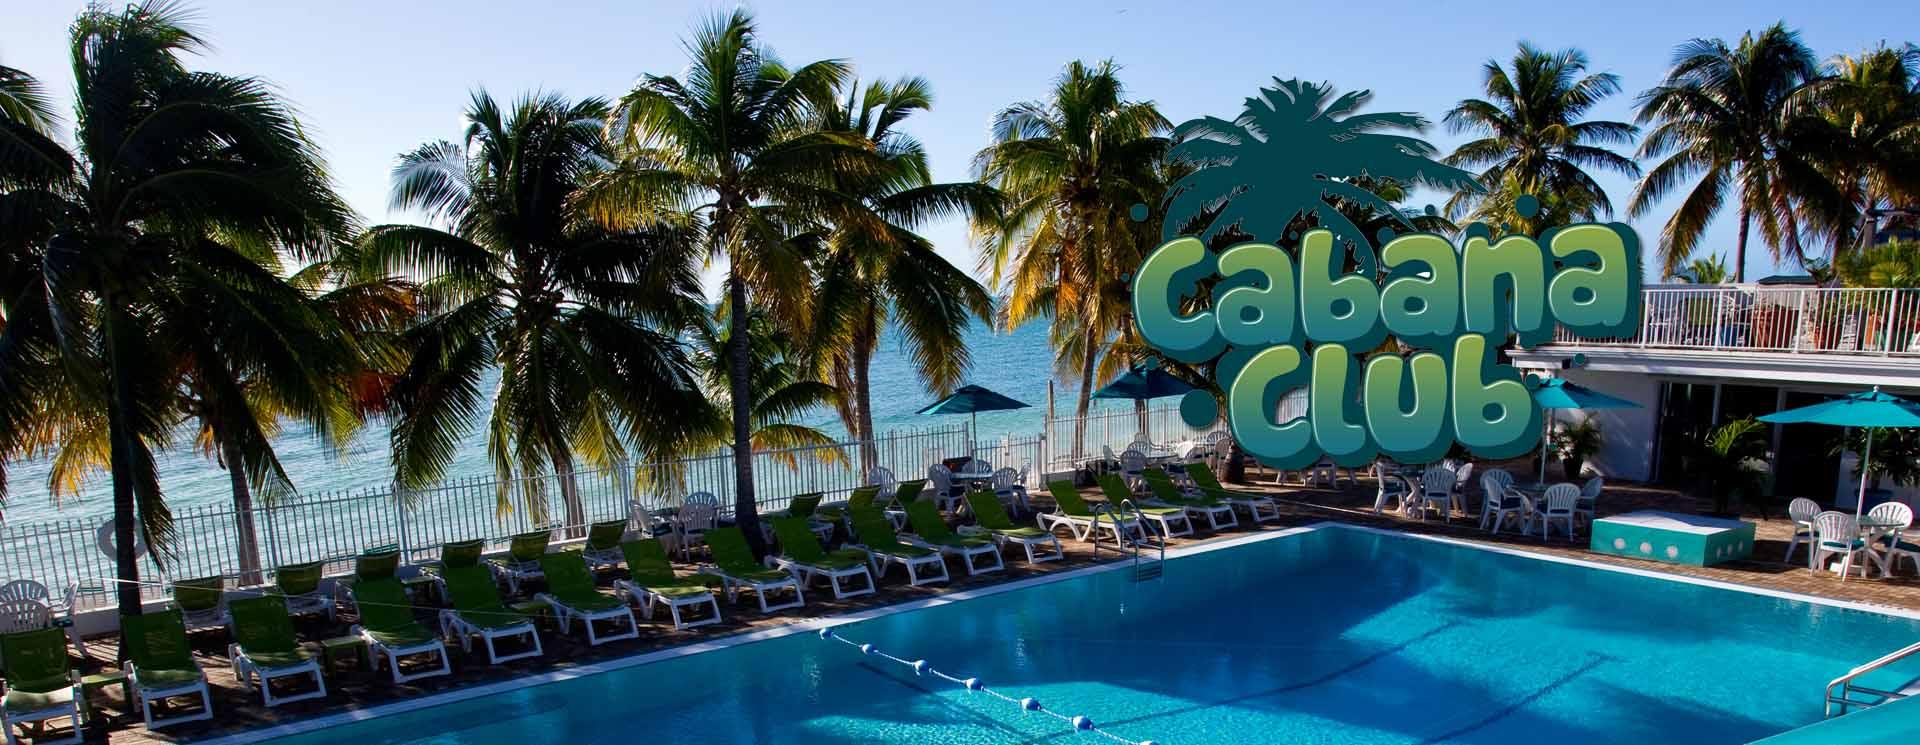 The Cabana Club Your Private Keys Swim Key Colony Beachthe